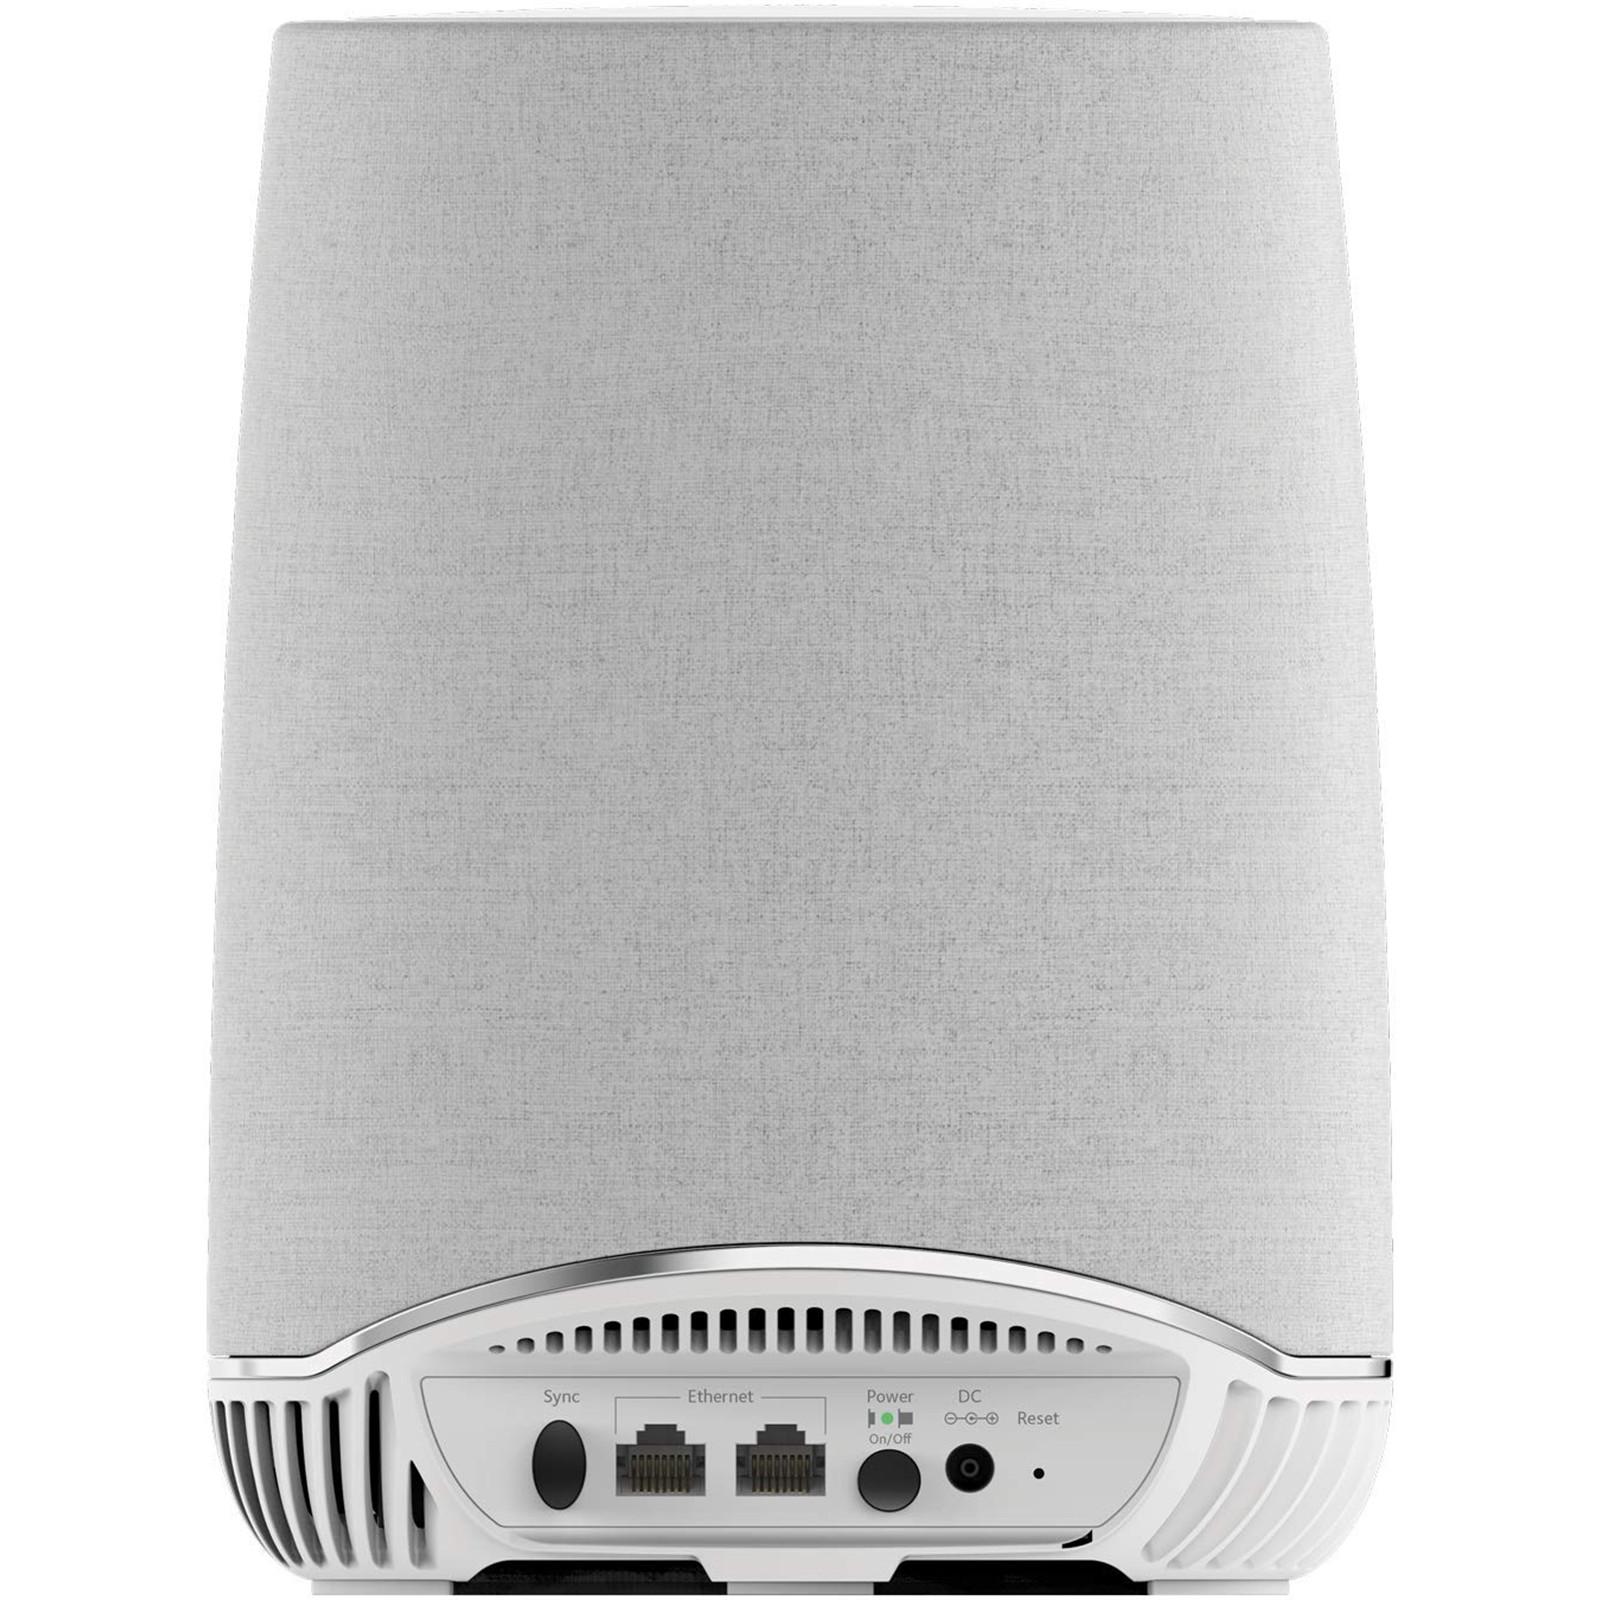 Buy the NETGEAR Orbi Voice RBS40V Tri-Band Add-on Satellite